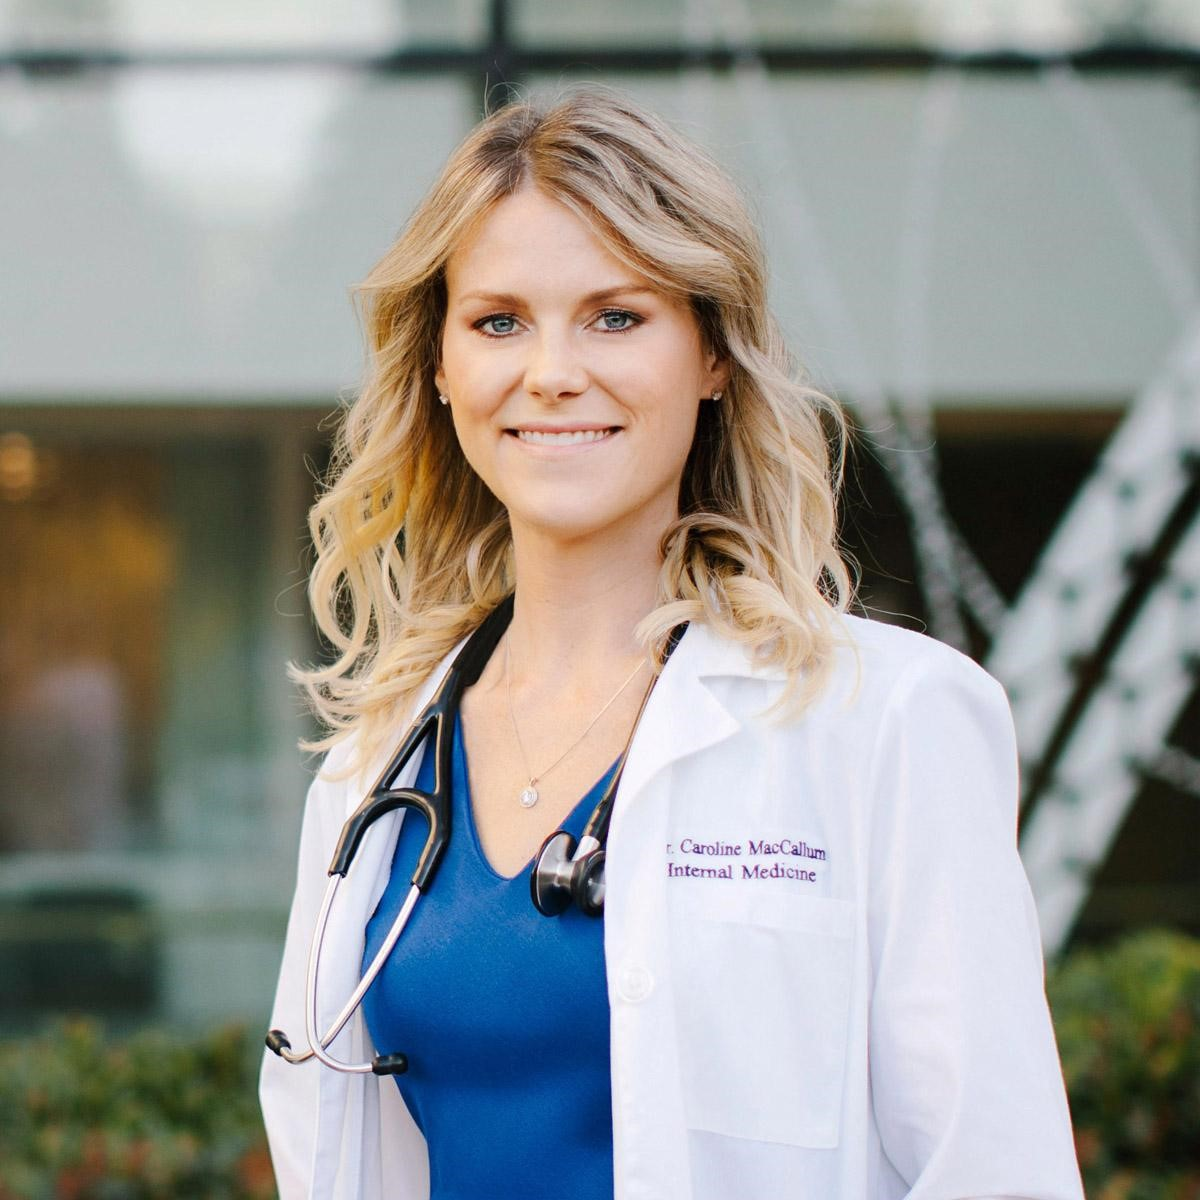 Dr. Caroline MacCallum